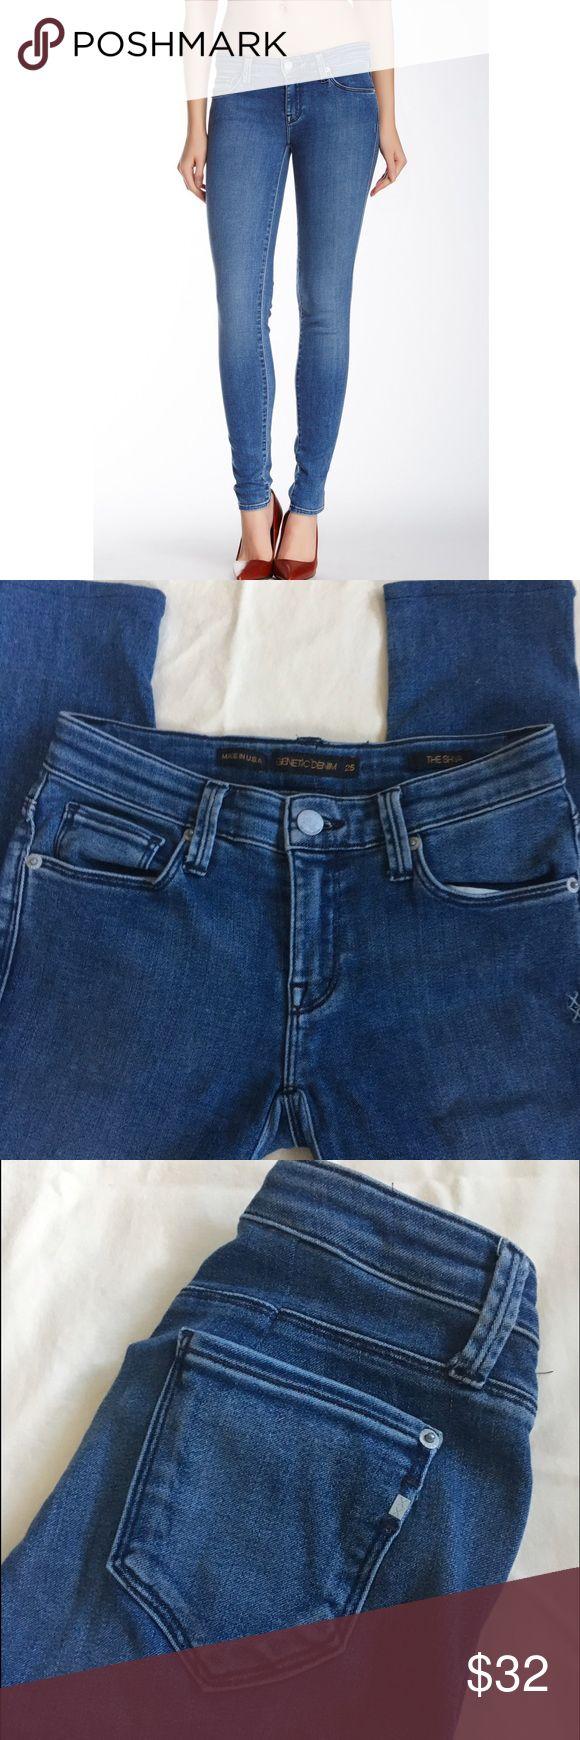 Genetic denim skinny jeans Genetic denim, Tokyo wash in The Shya Cigarette style. Size 25, inseam approx. 28.5. Great condition!!!(4) Genetic Denim Jeans Skinny